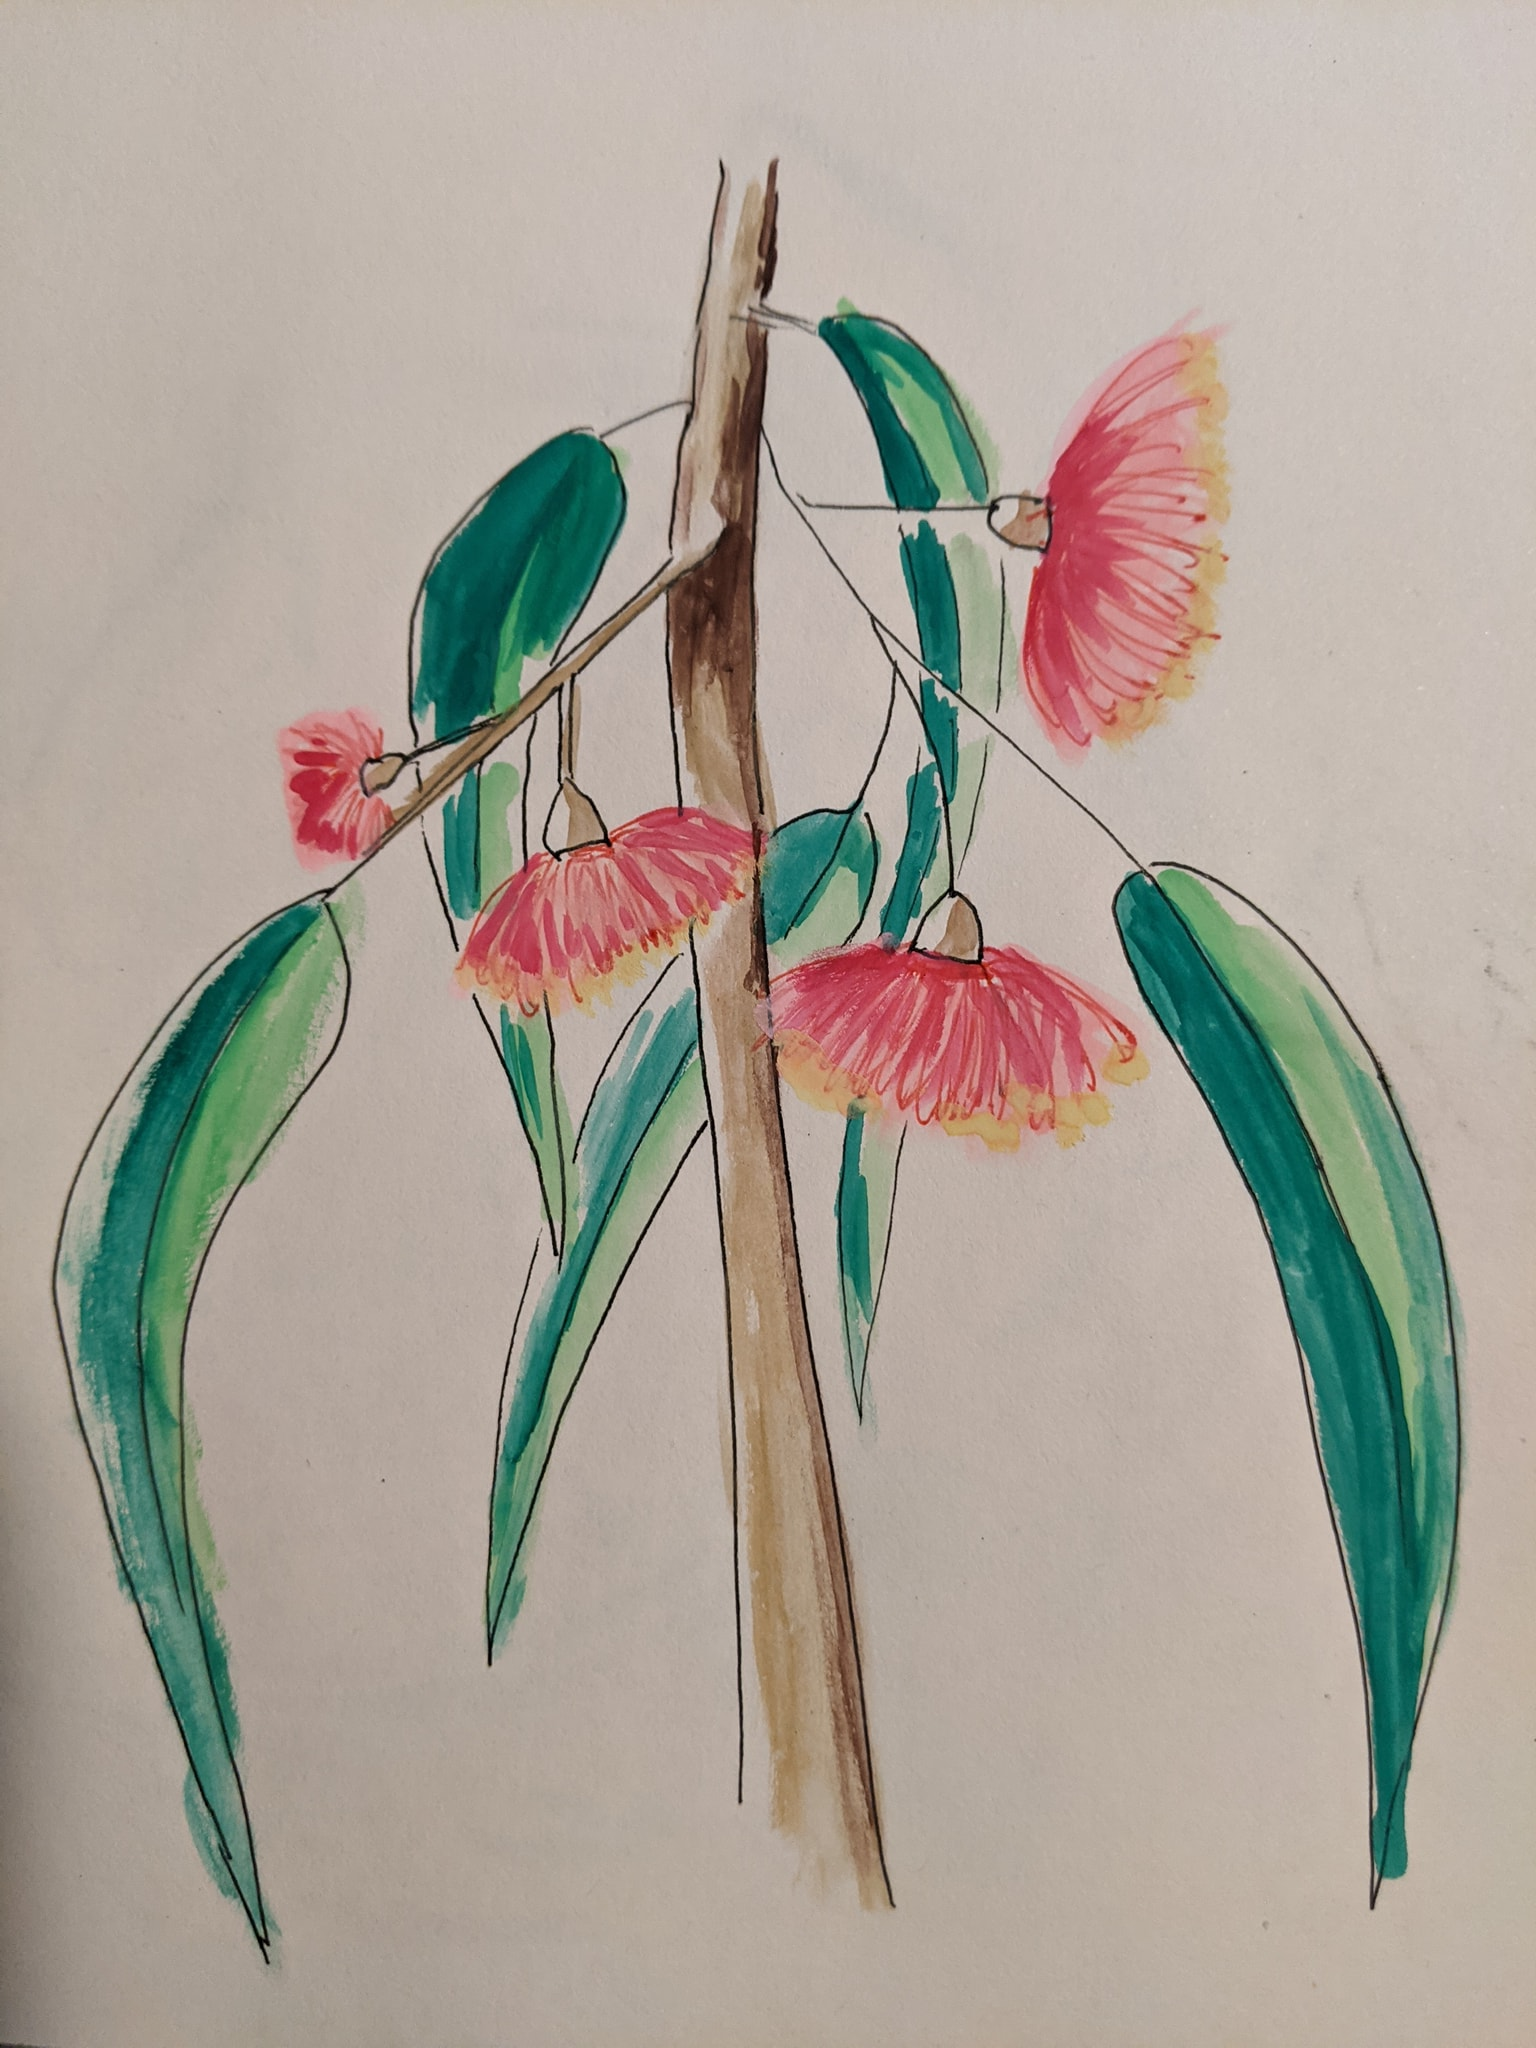 Gum Tree Flowers in watercolour | Sandra Burns Art